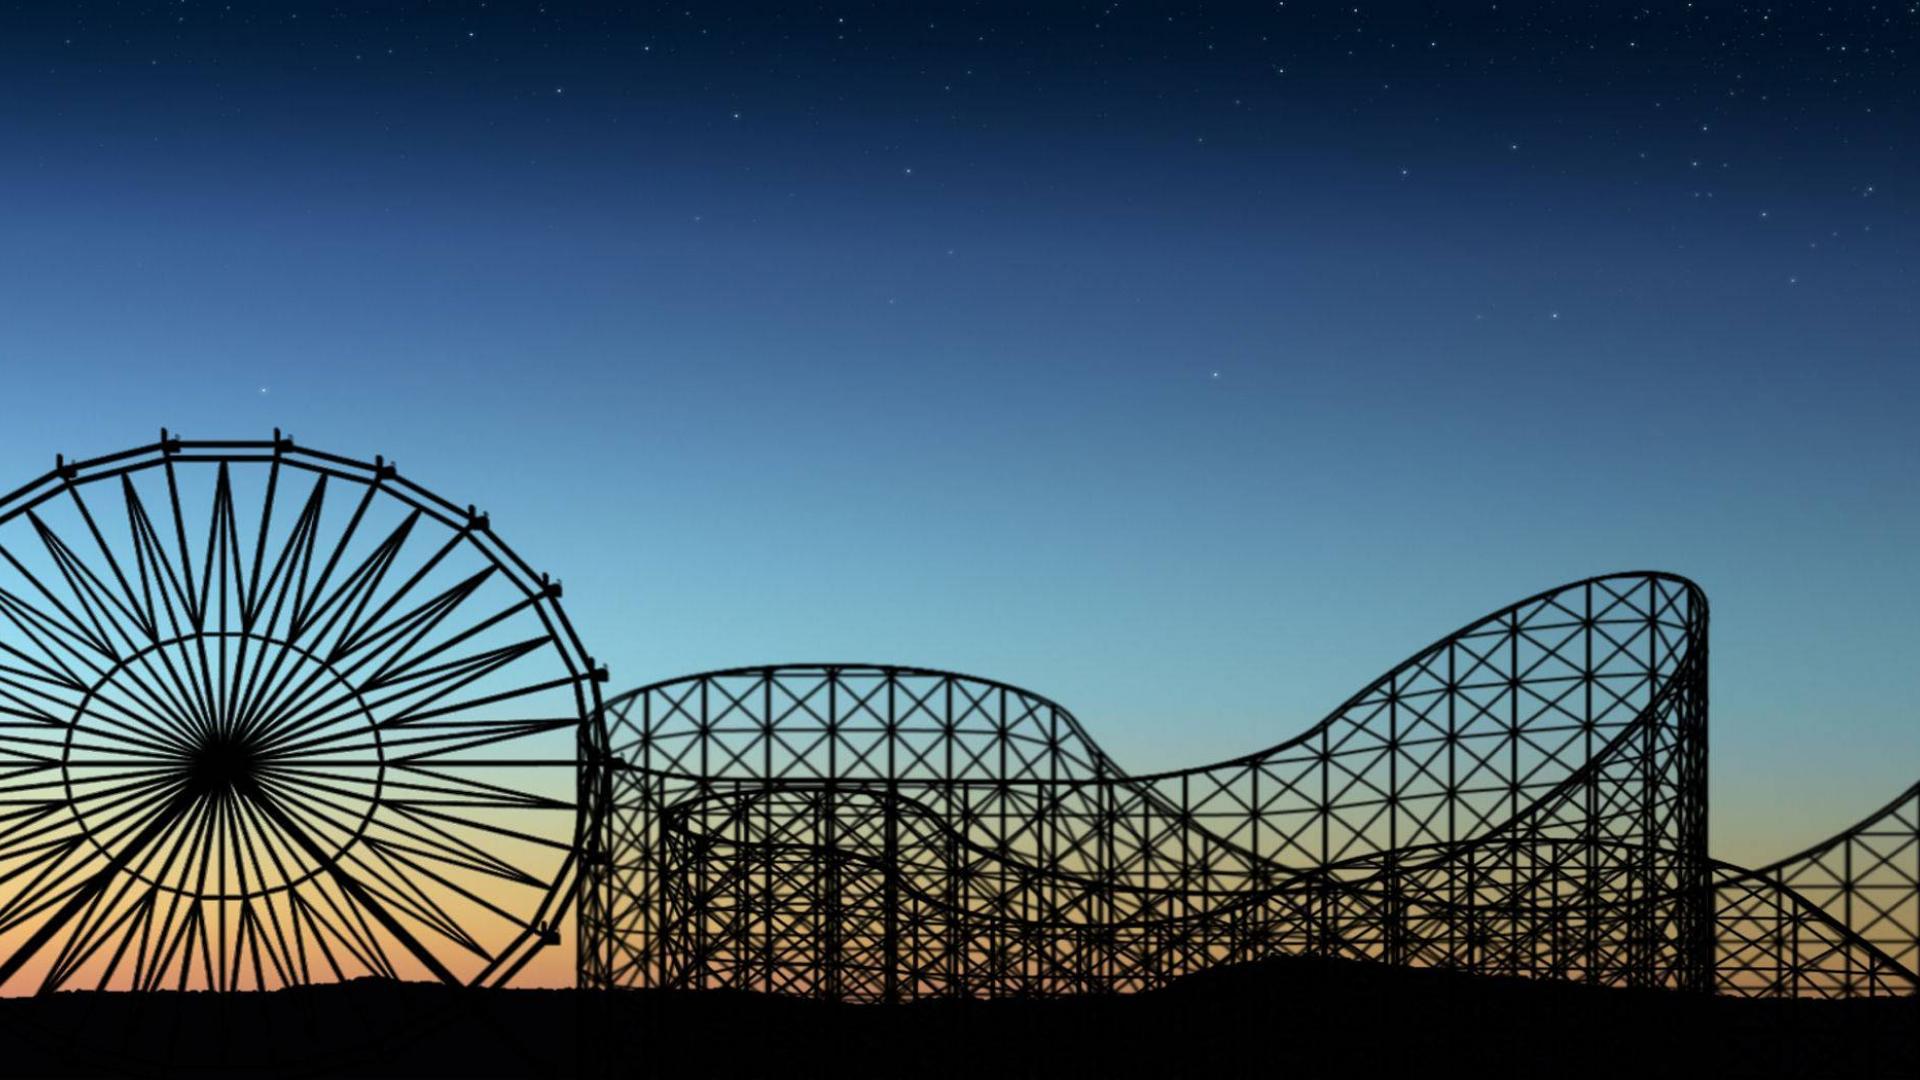 Обои Rollercoaster ride, ночь. Города foto 18